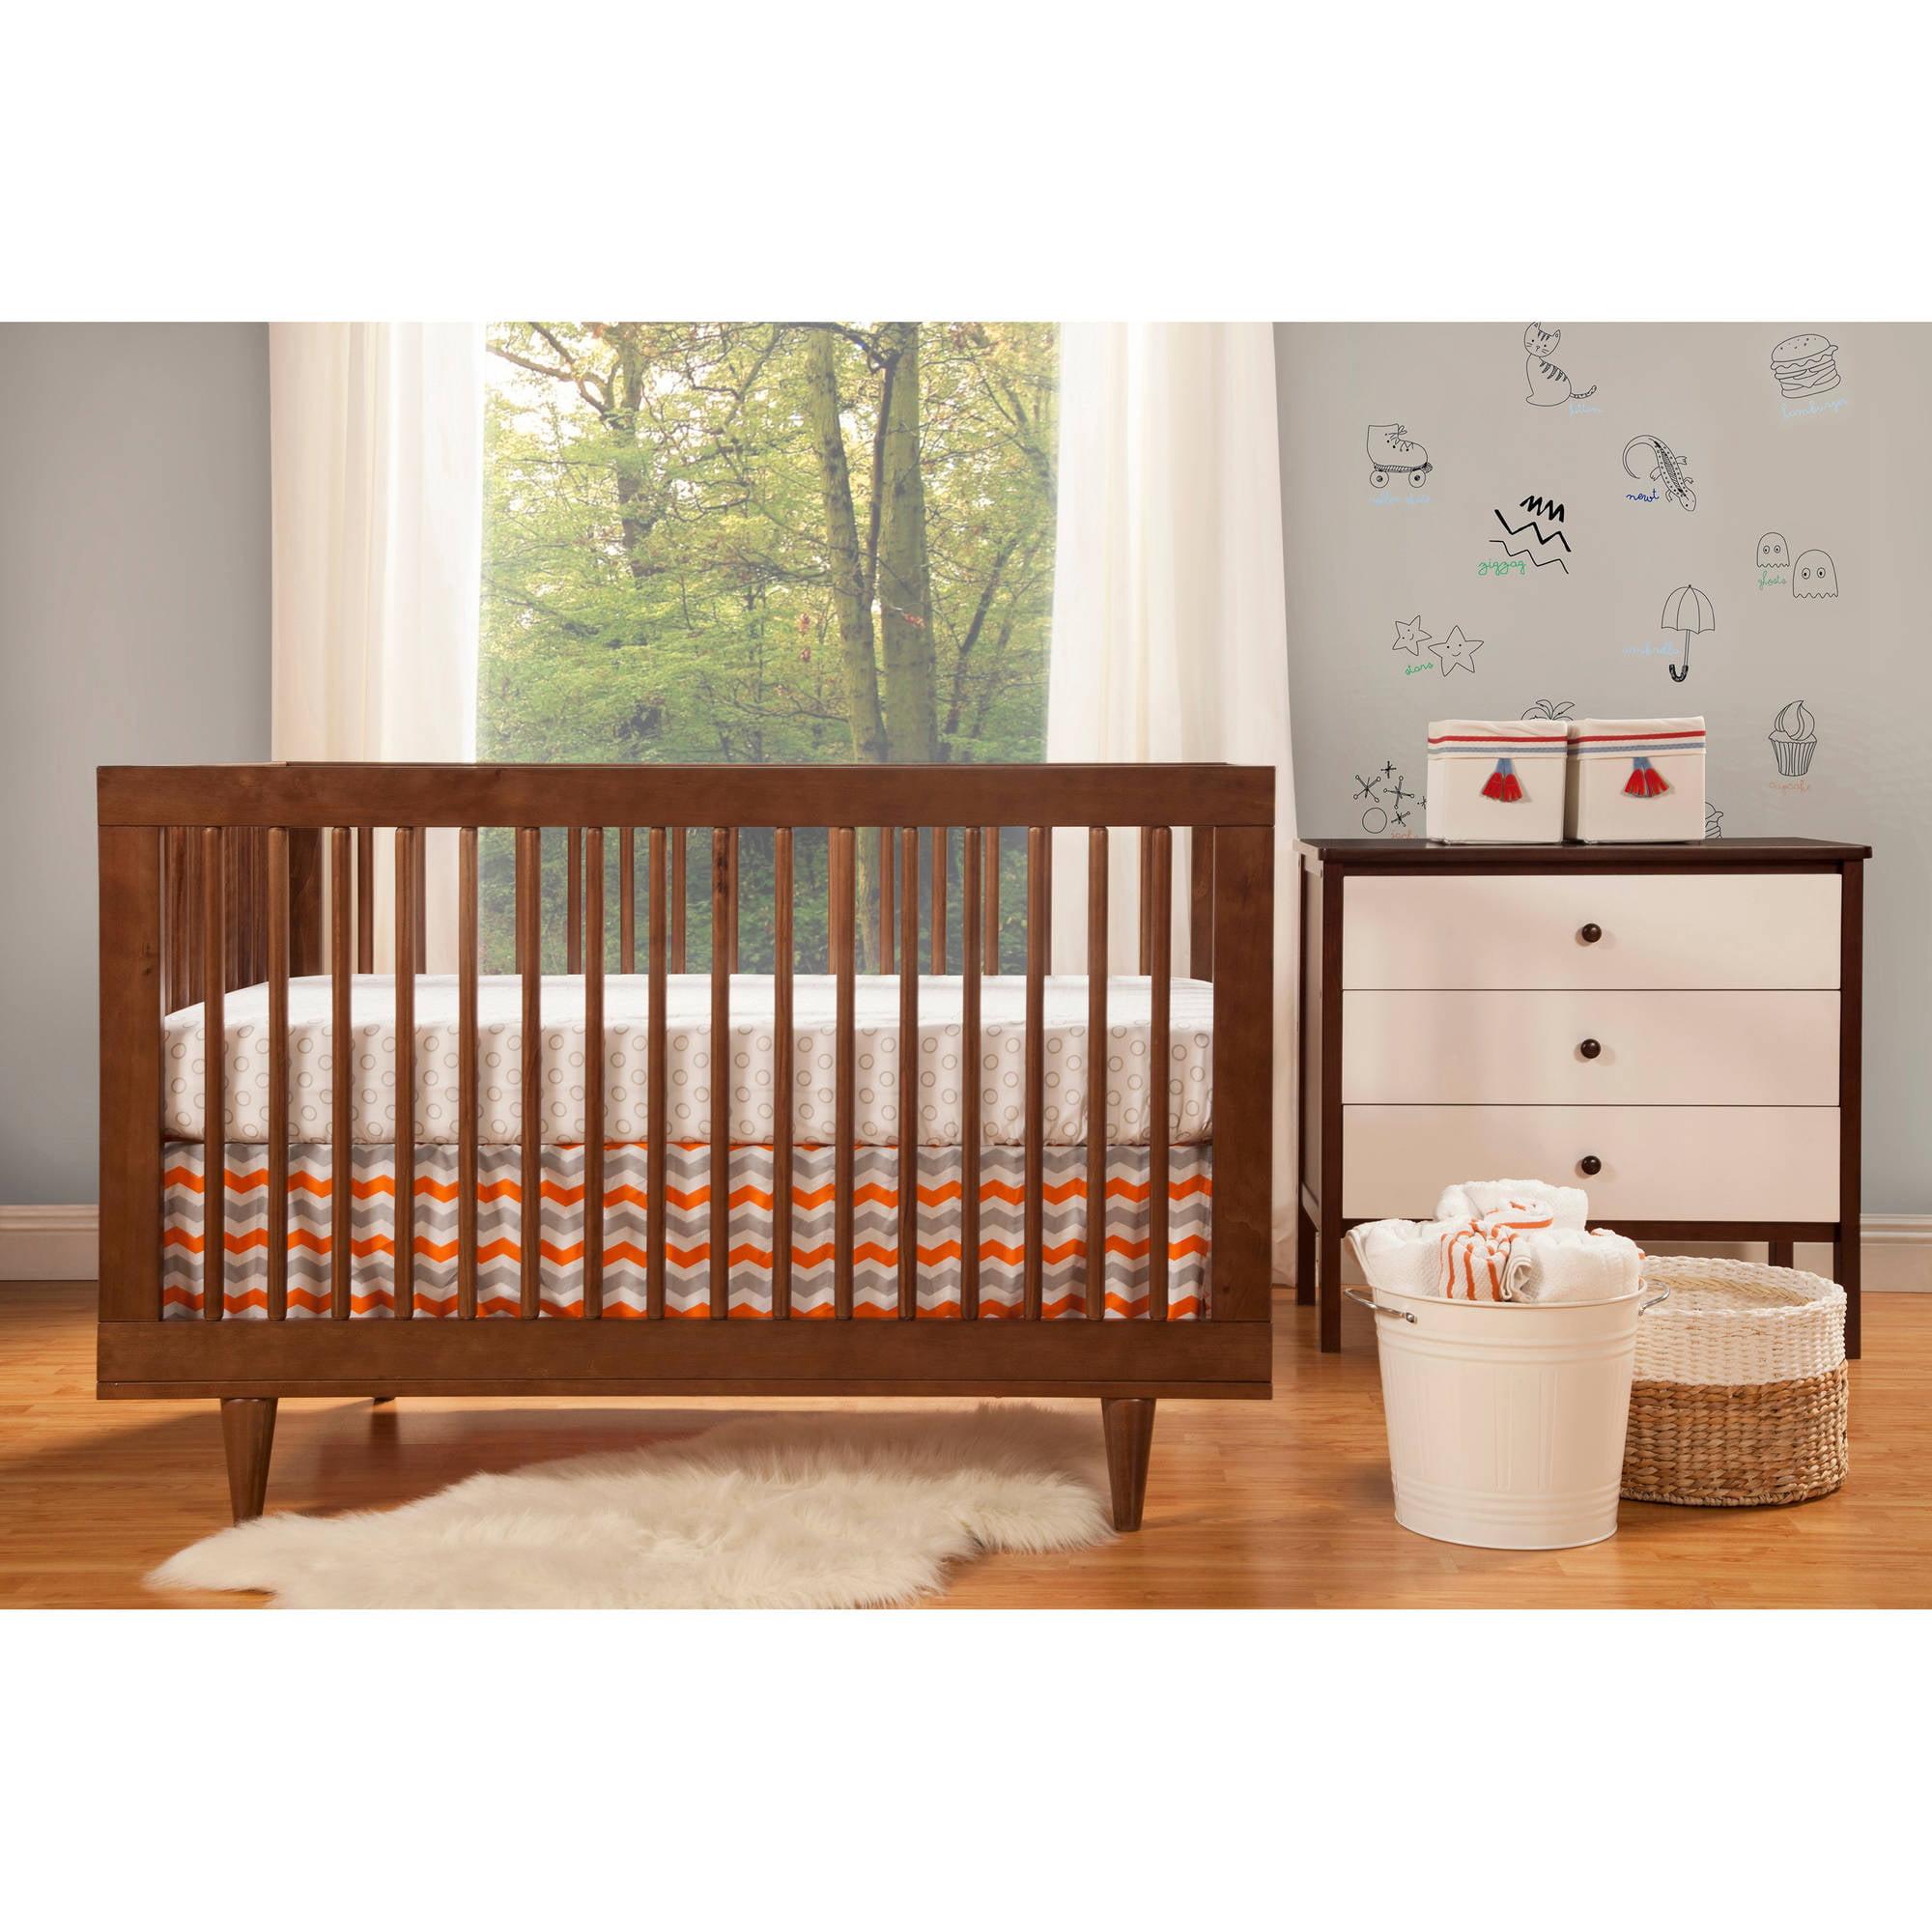 Beautiful Baby Mod Marley 3 In 1 Convertible Crib Walnut   Walmart.com